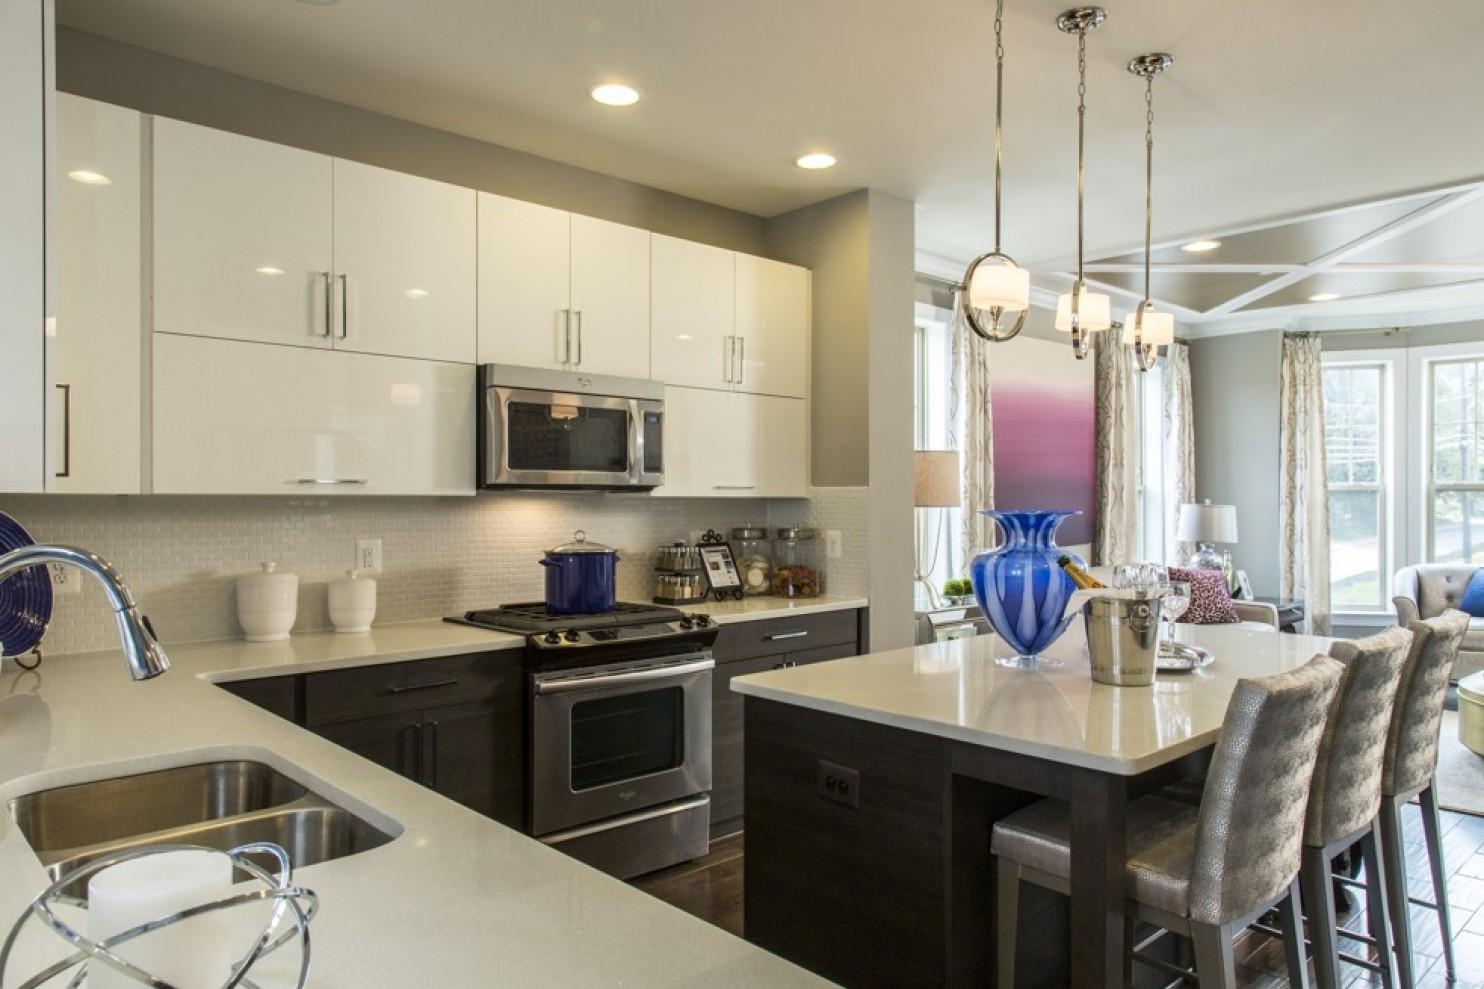 Maximized kitchen